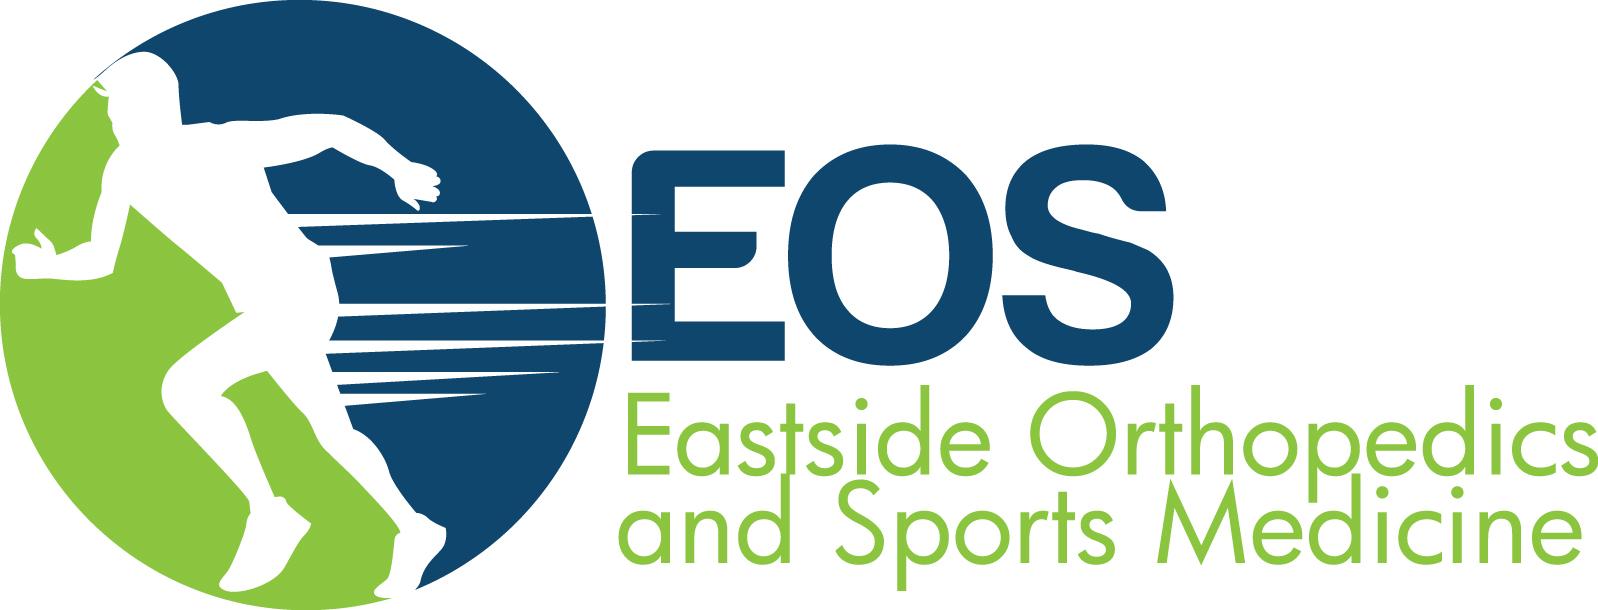 Eastside Orthopedics and Sports Medicine